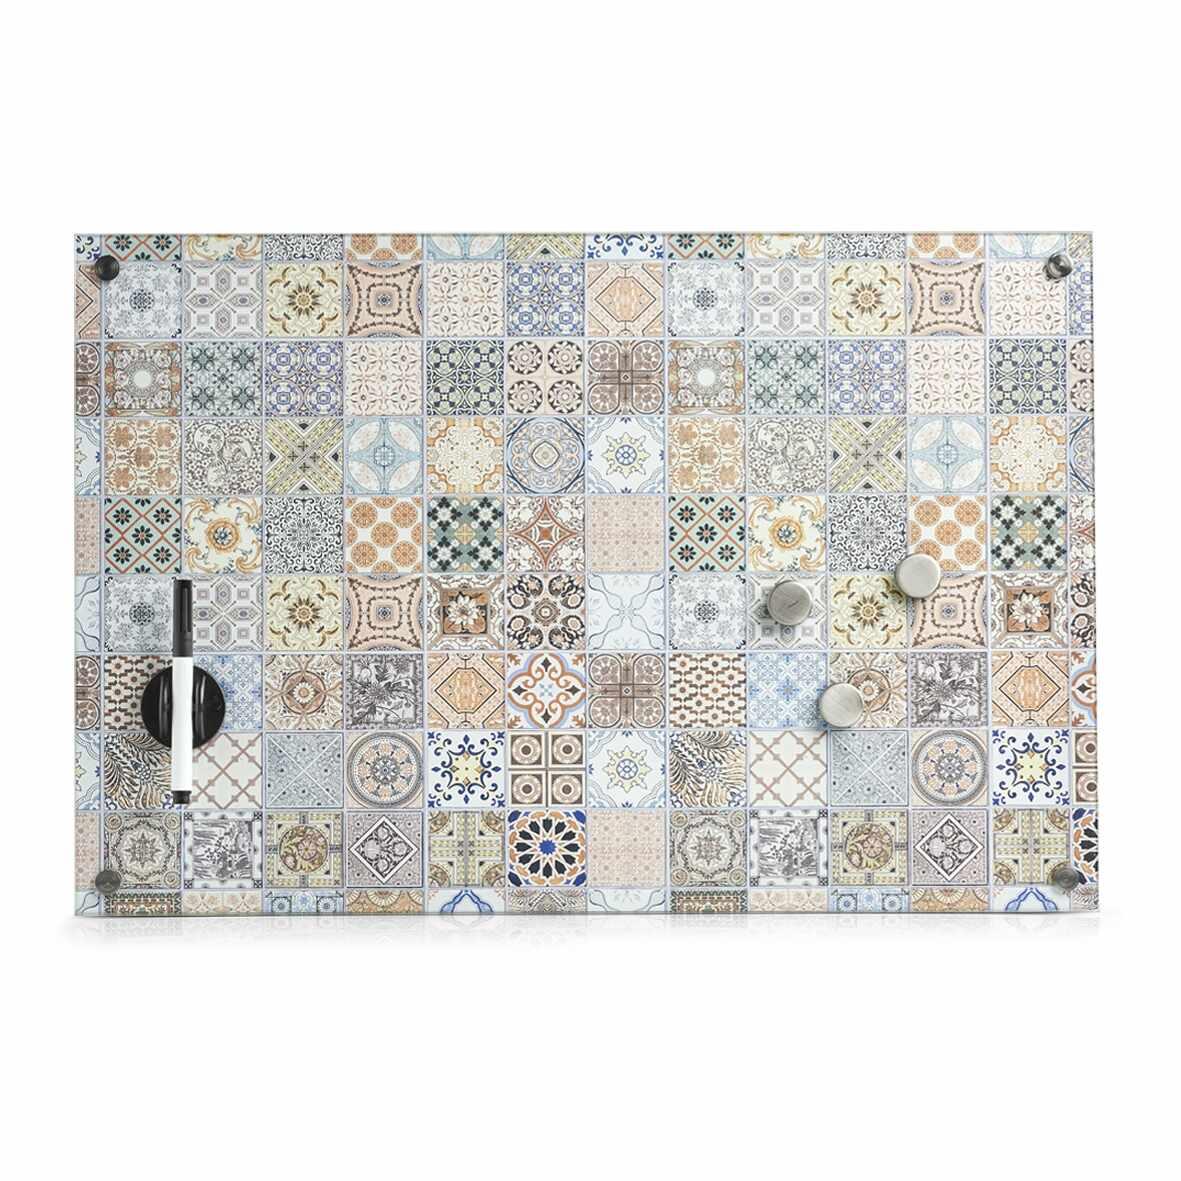 Memo Board din sticla cu 4 accesorii, Mosaic Multicolor, L60xl40 cm la pret 161 lei